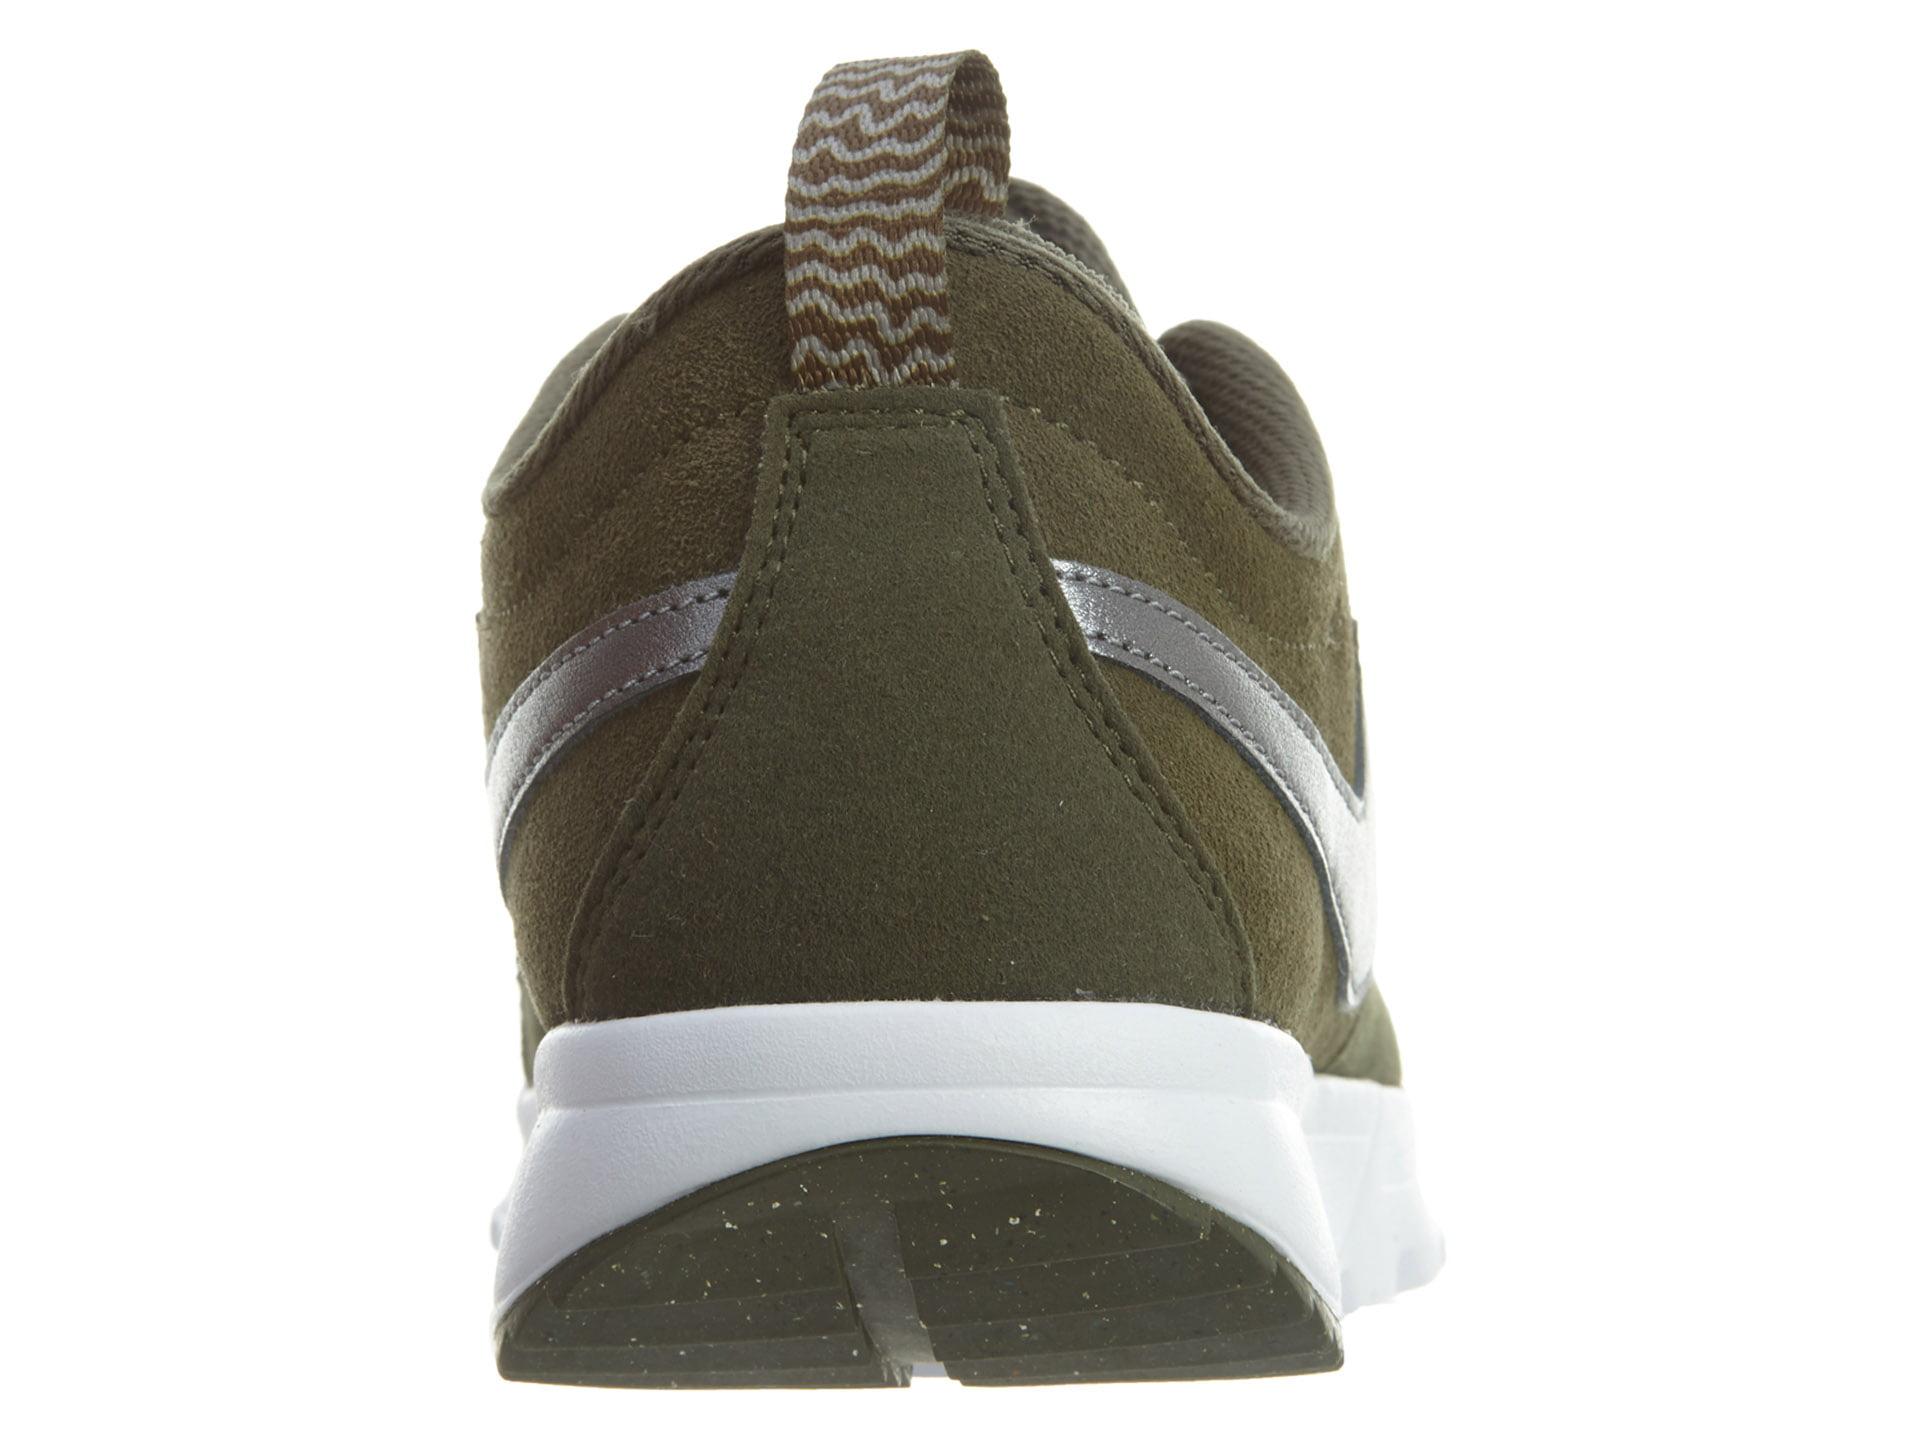 9d9465f34b32 Nike - Mens Nike SB Trainerendor L Cargo Khaki Metallic Cool Grey White  80630 - Walmart.com